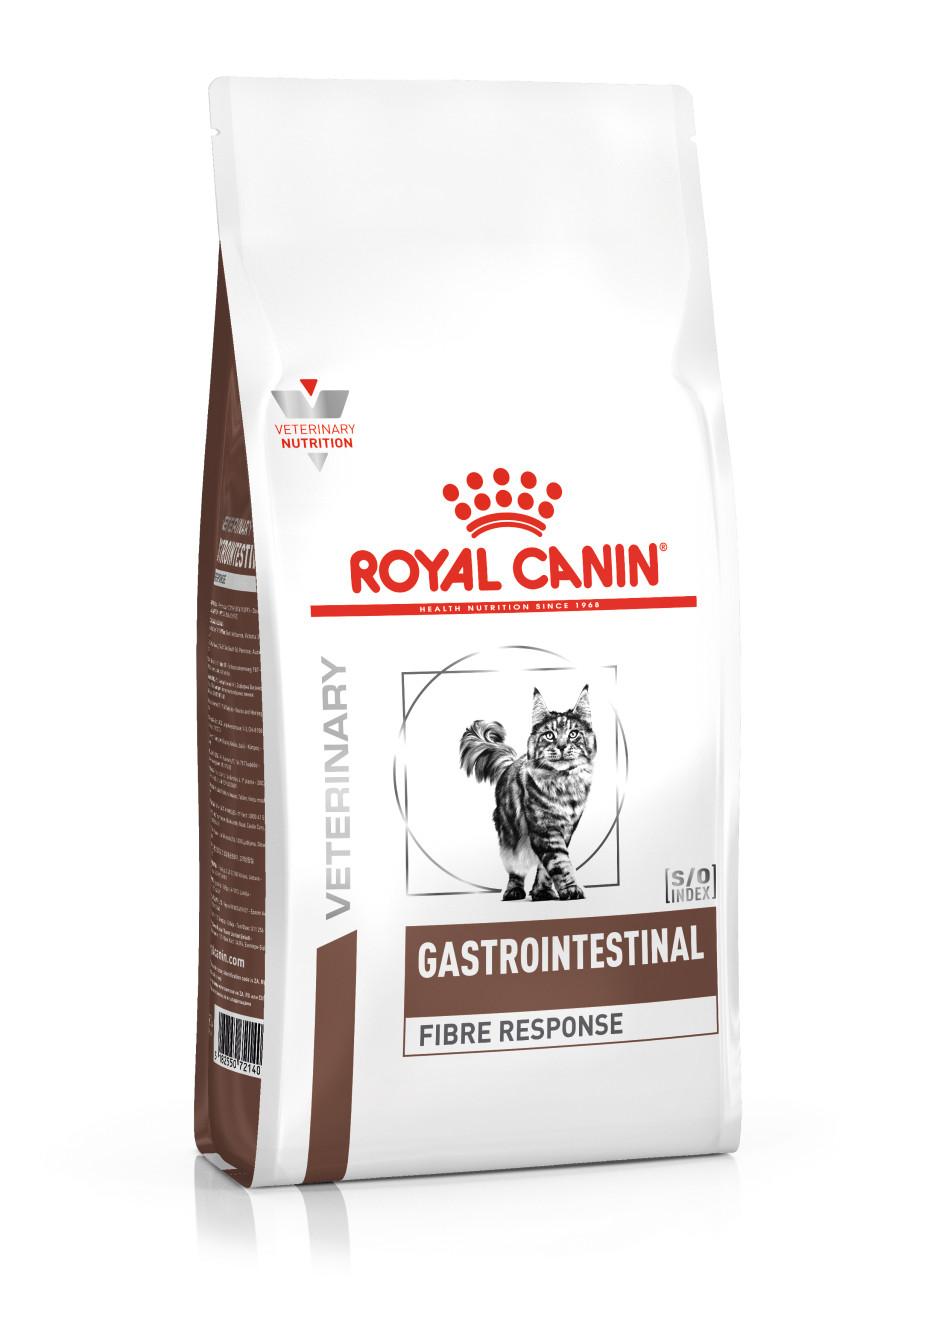 Royal Canin Veterinary Gastrointestinal Fibre Response Katzenfutter